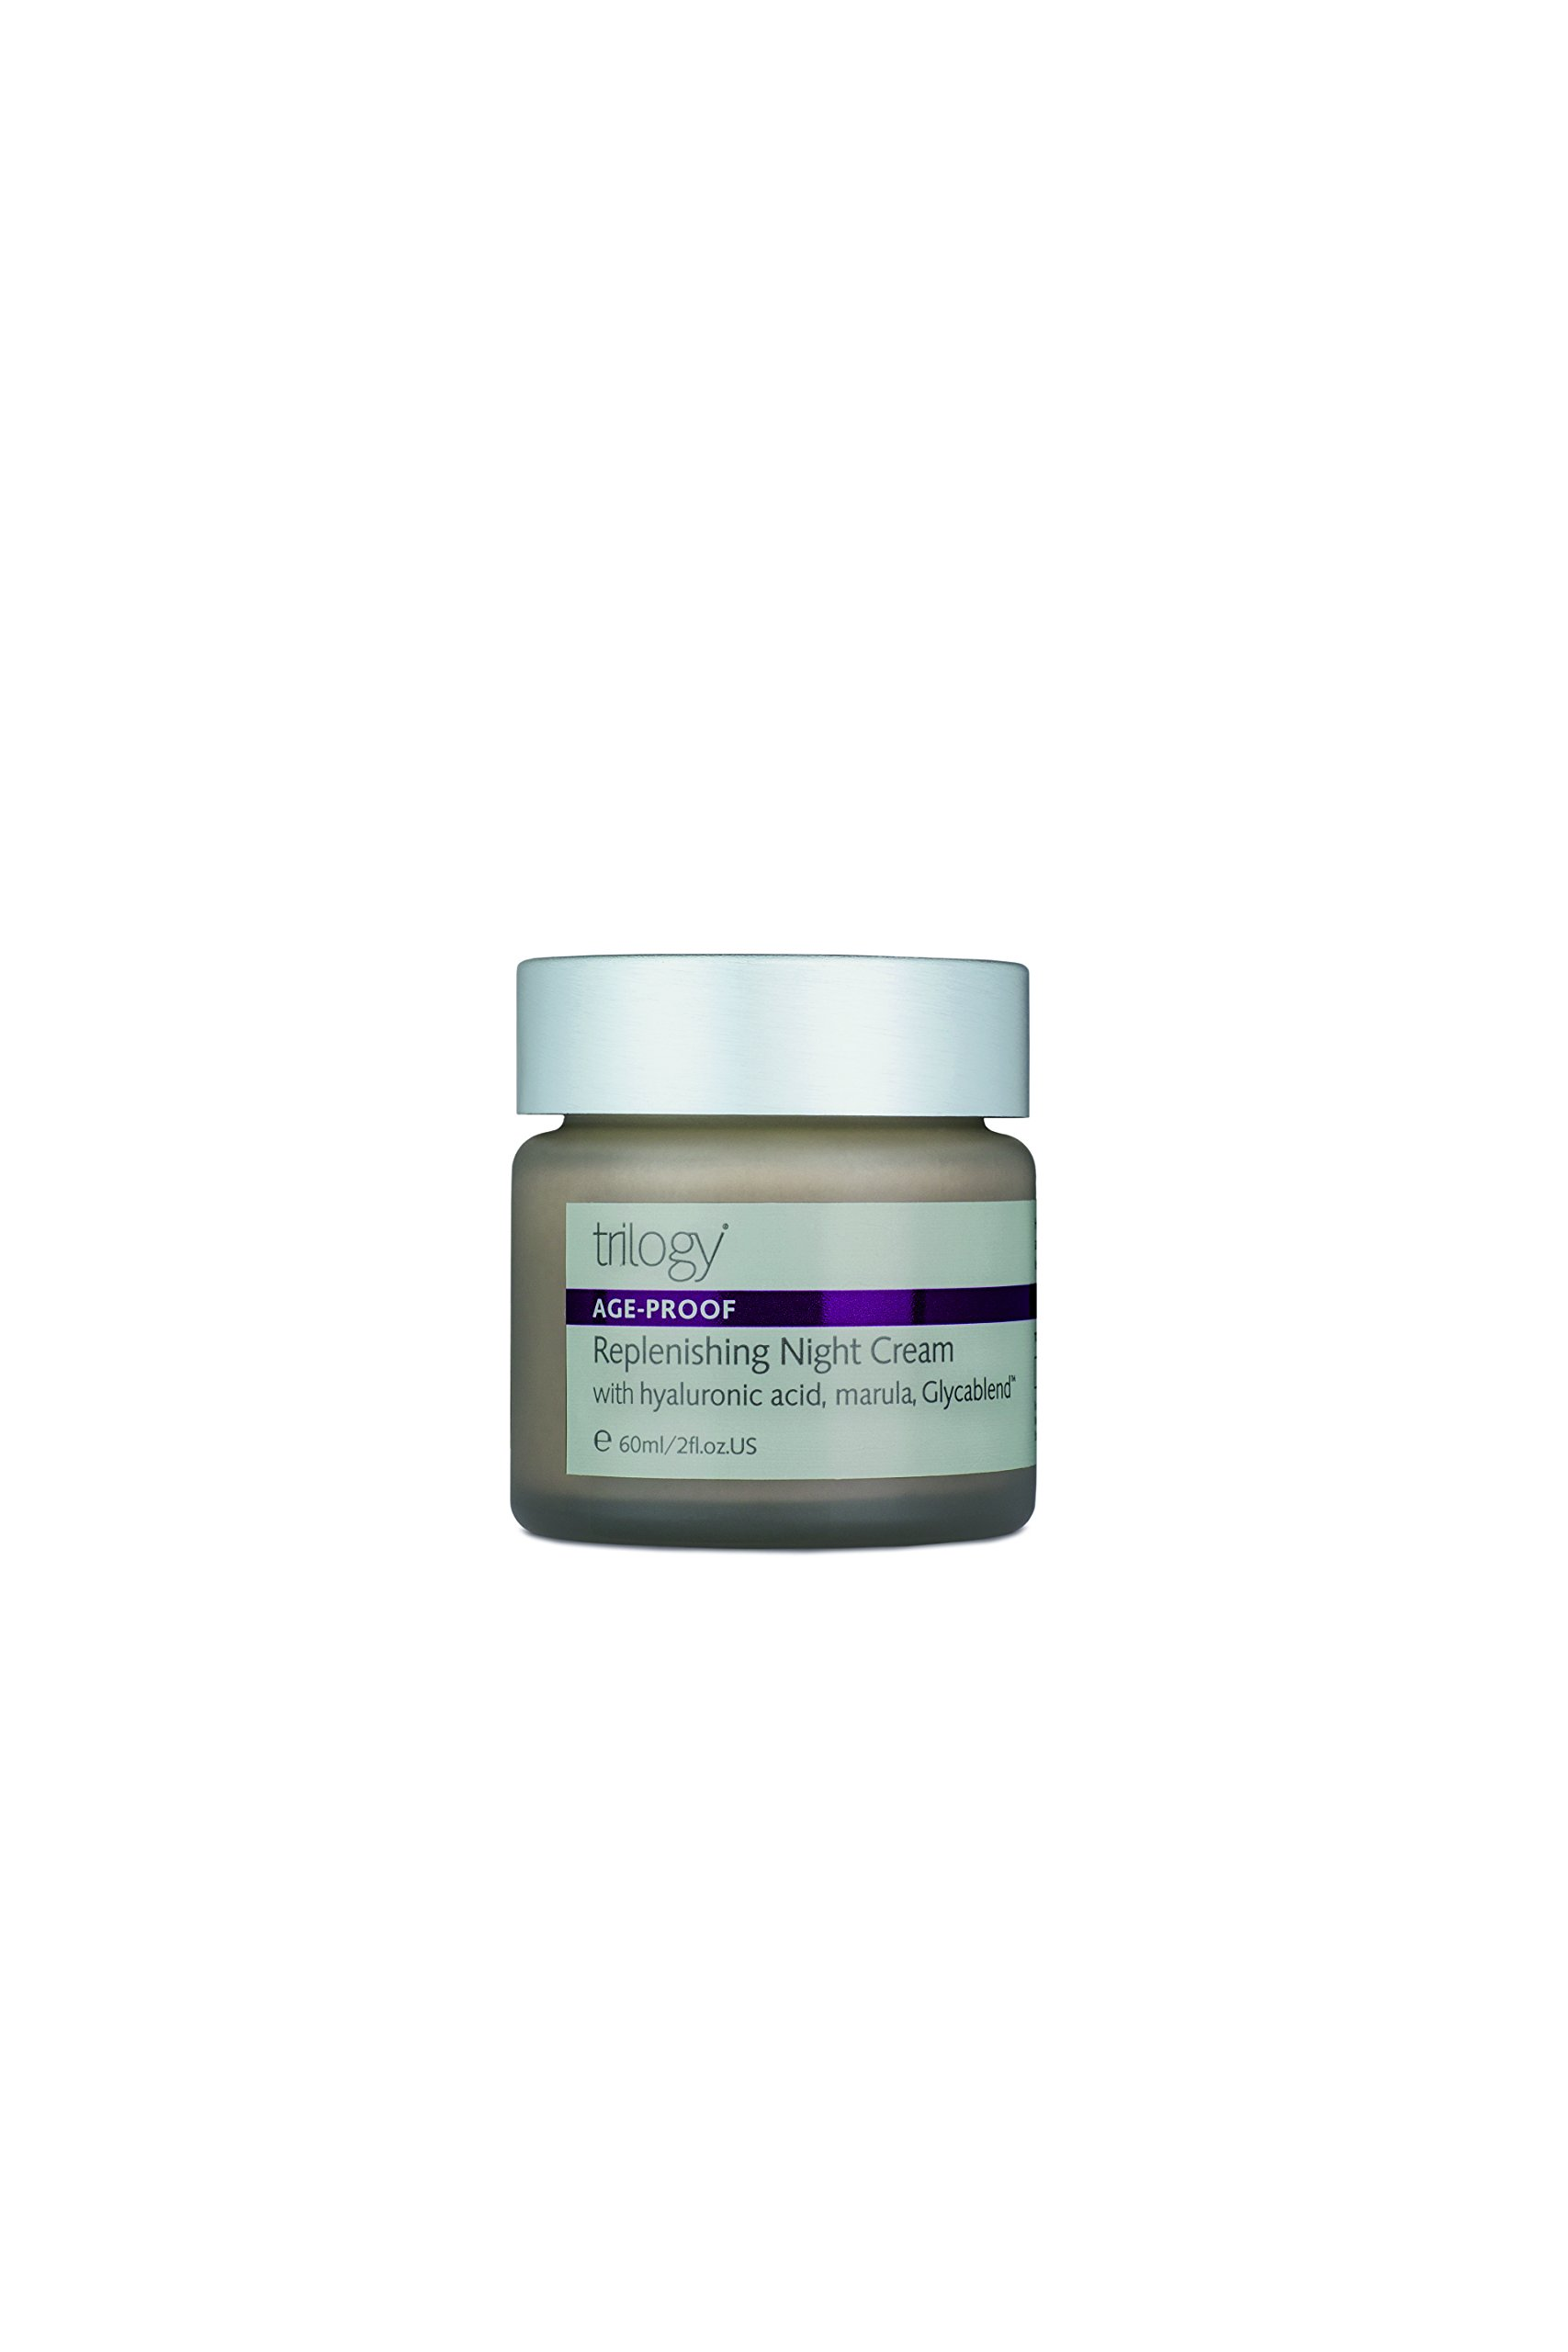 50fb5afdef6 Amazon.com: Trilogy Coq10 Booster Oil (20Ml): Beauty